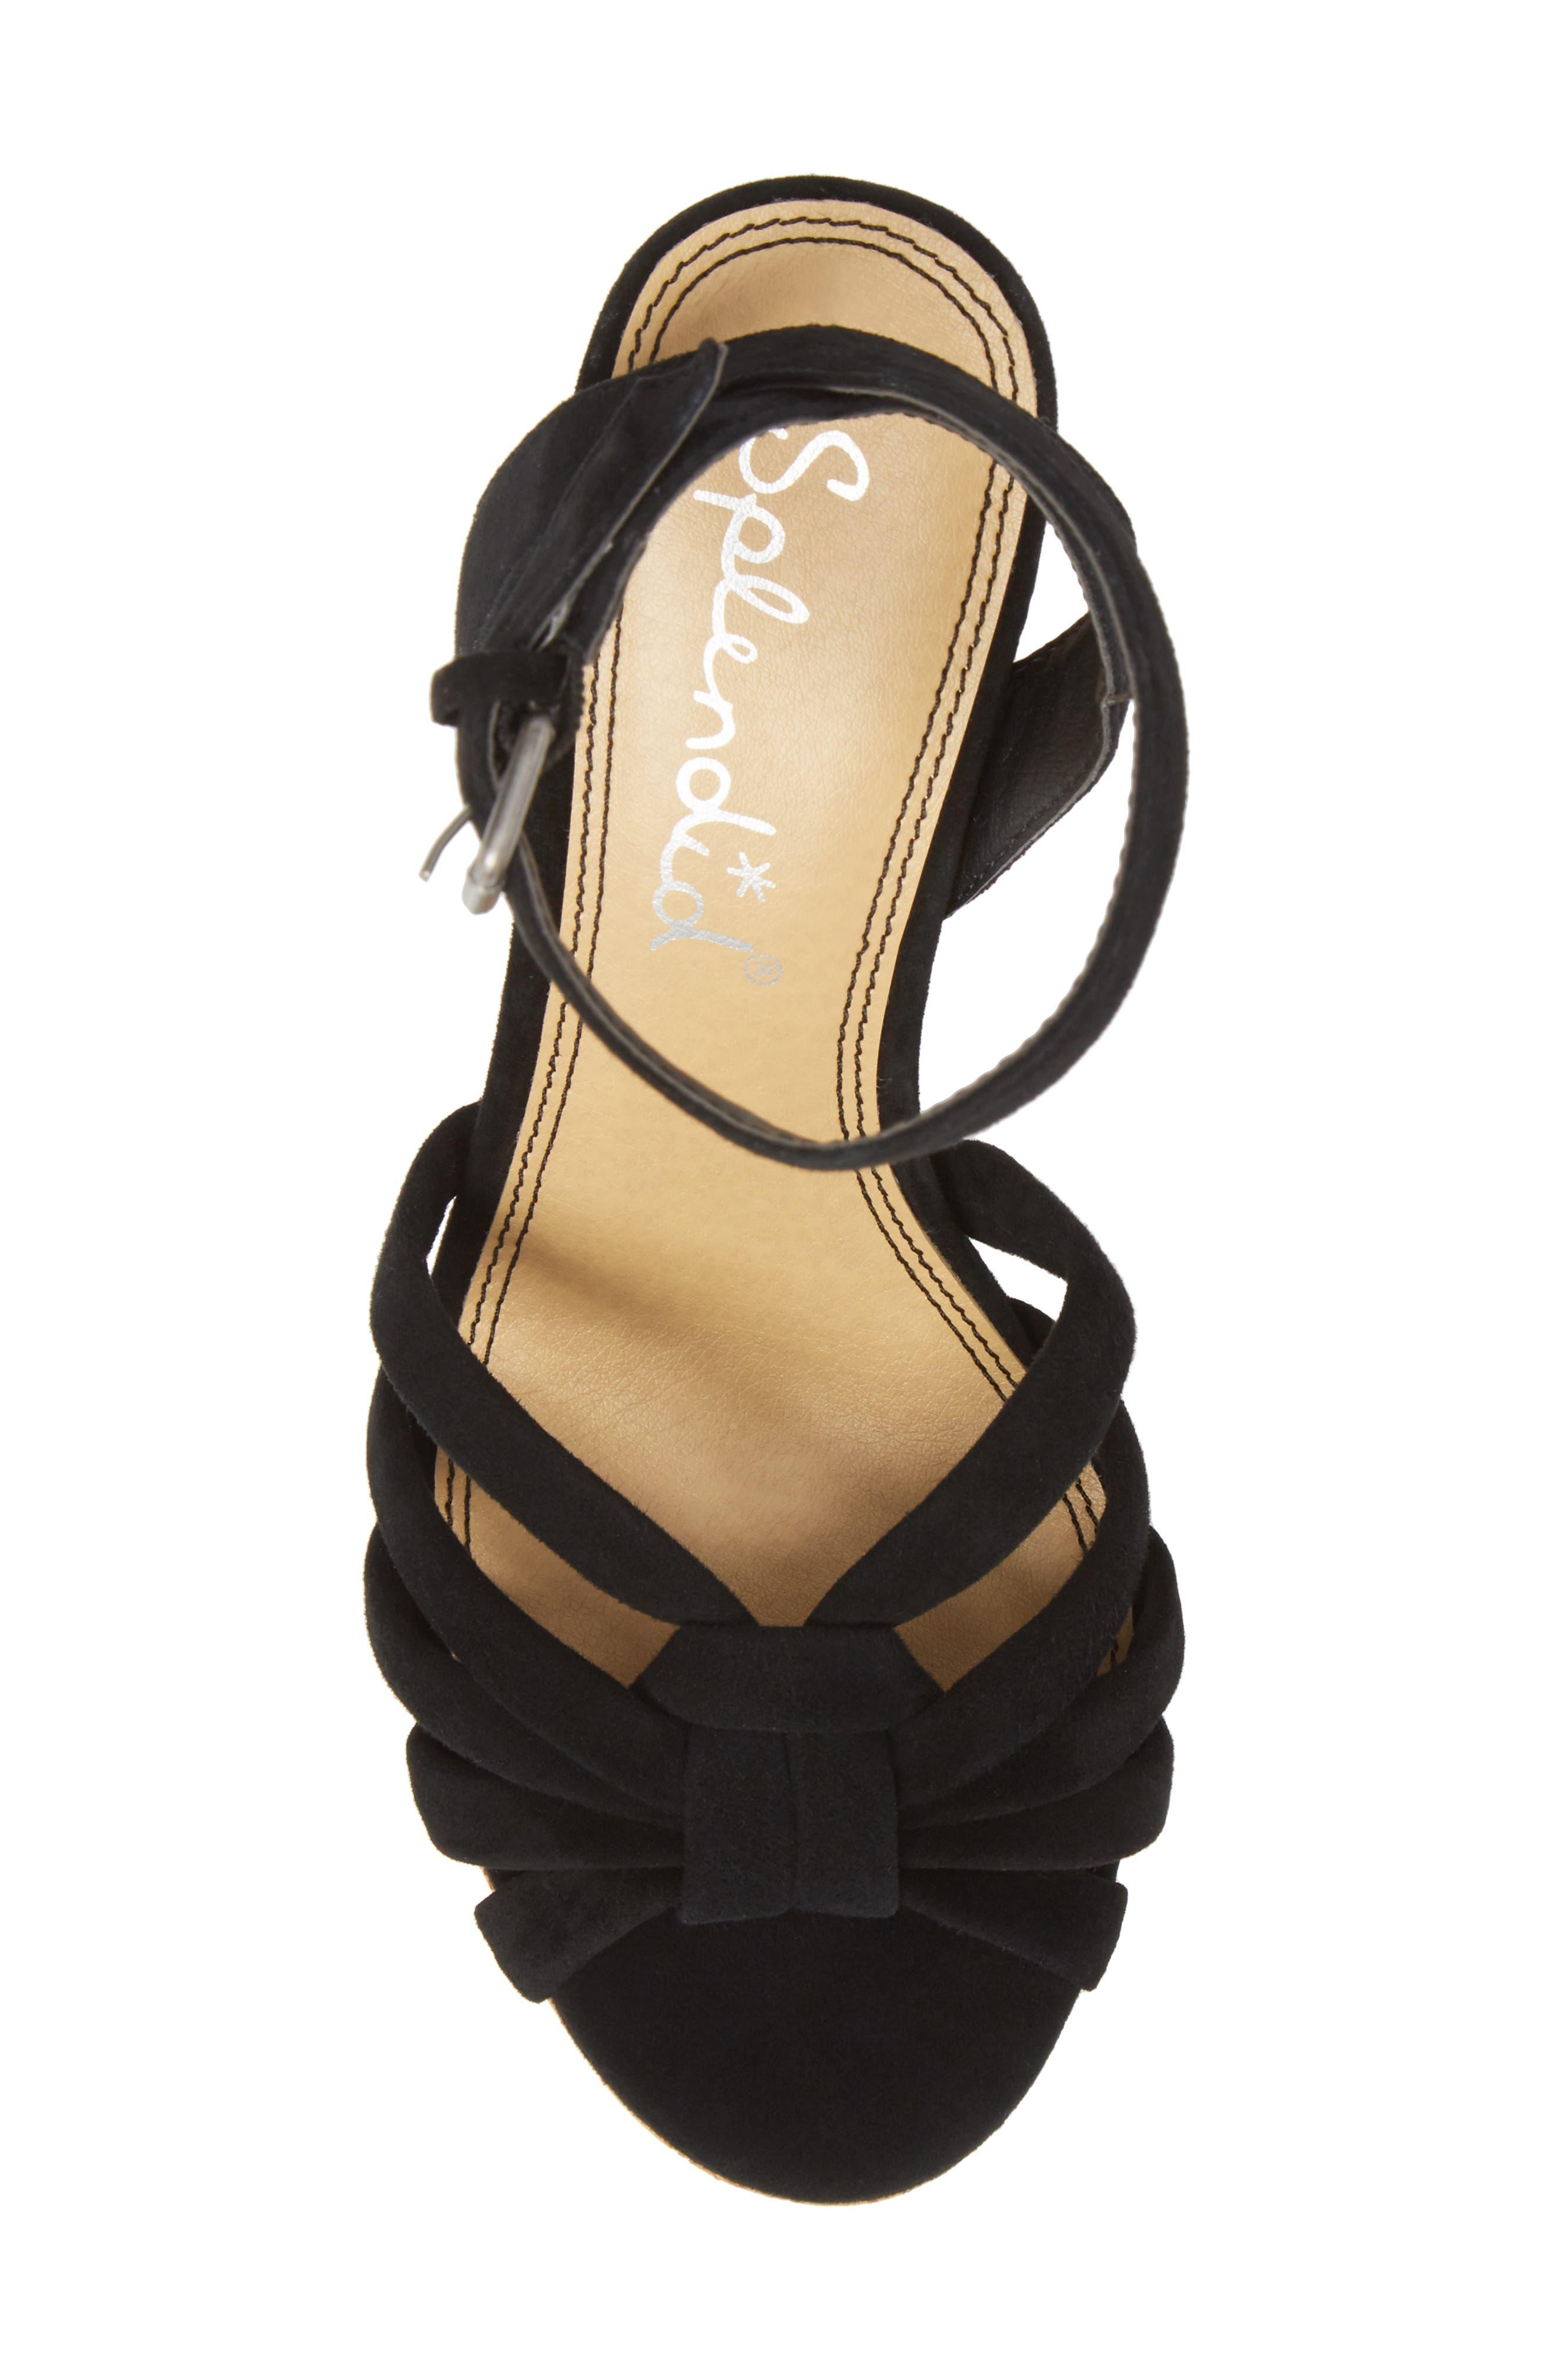 Fallon Wedge Sandal,                             Alternate thumbnail 5, color,                             BLACK SUEDE